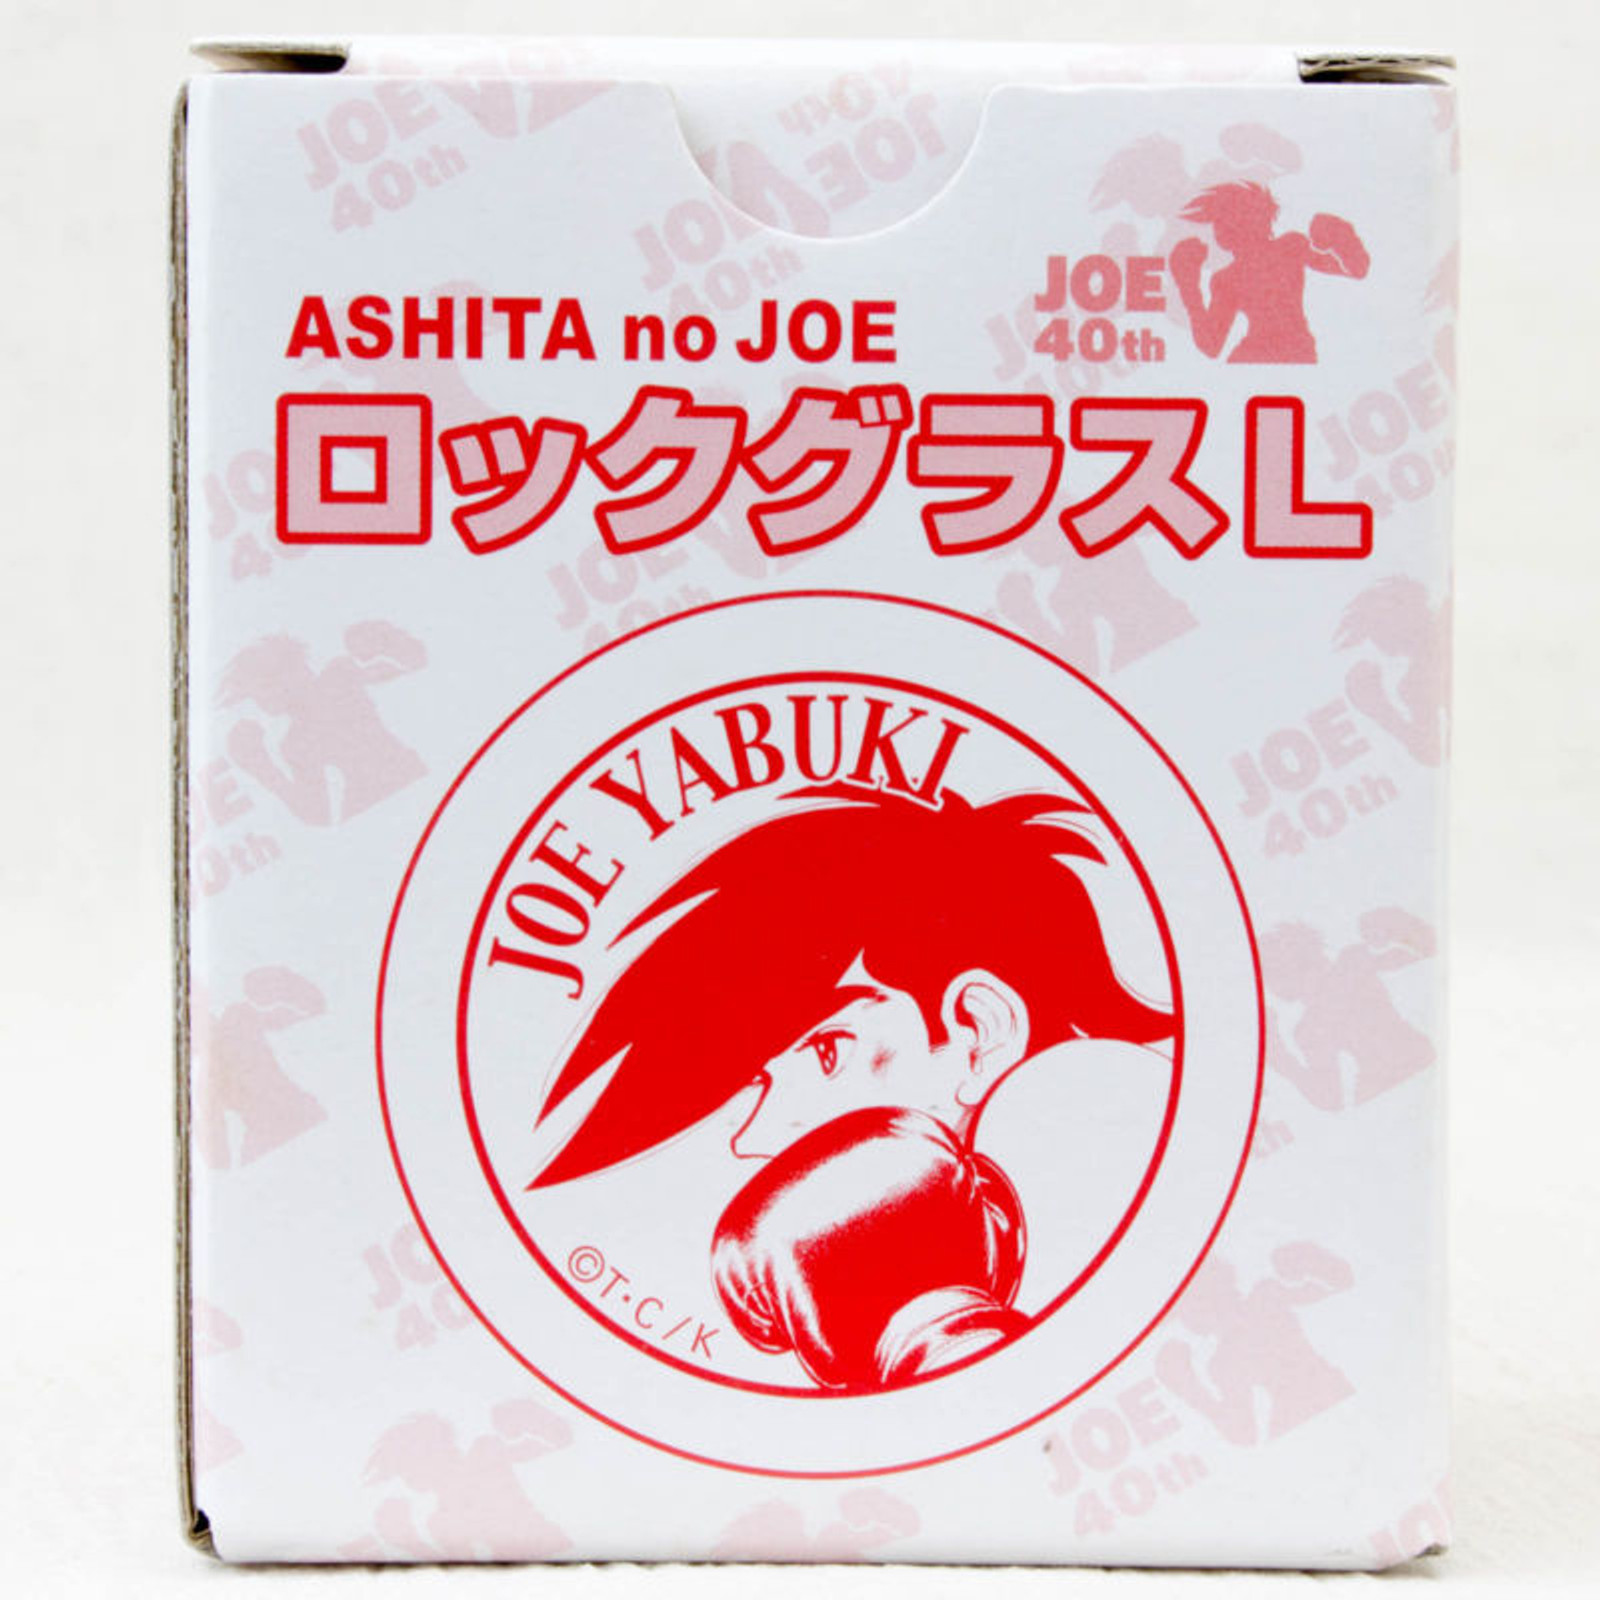 Ashita no Joe Yabuki Joe Rocks Glass JOE 40th Anniversary JAPAN ANIME MANGA